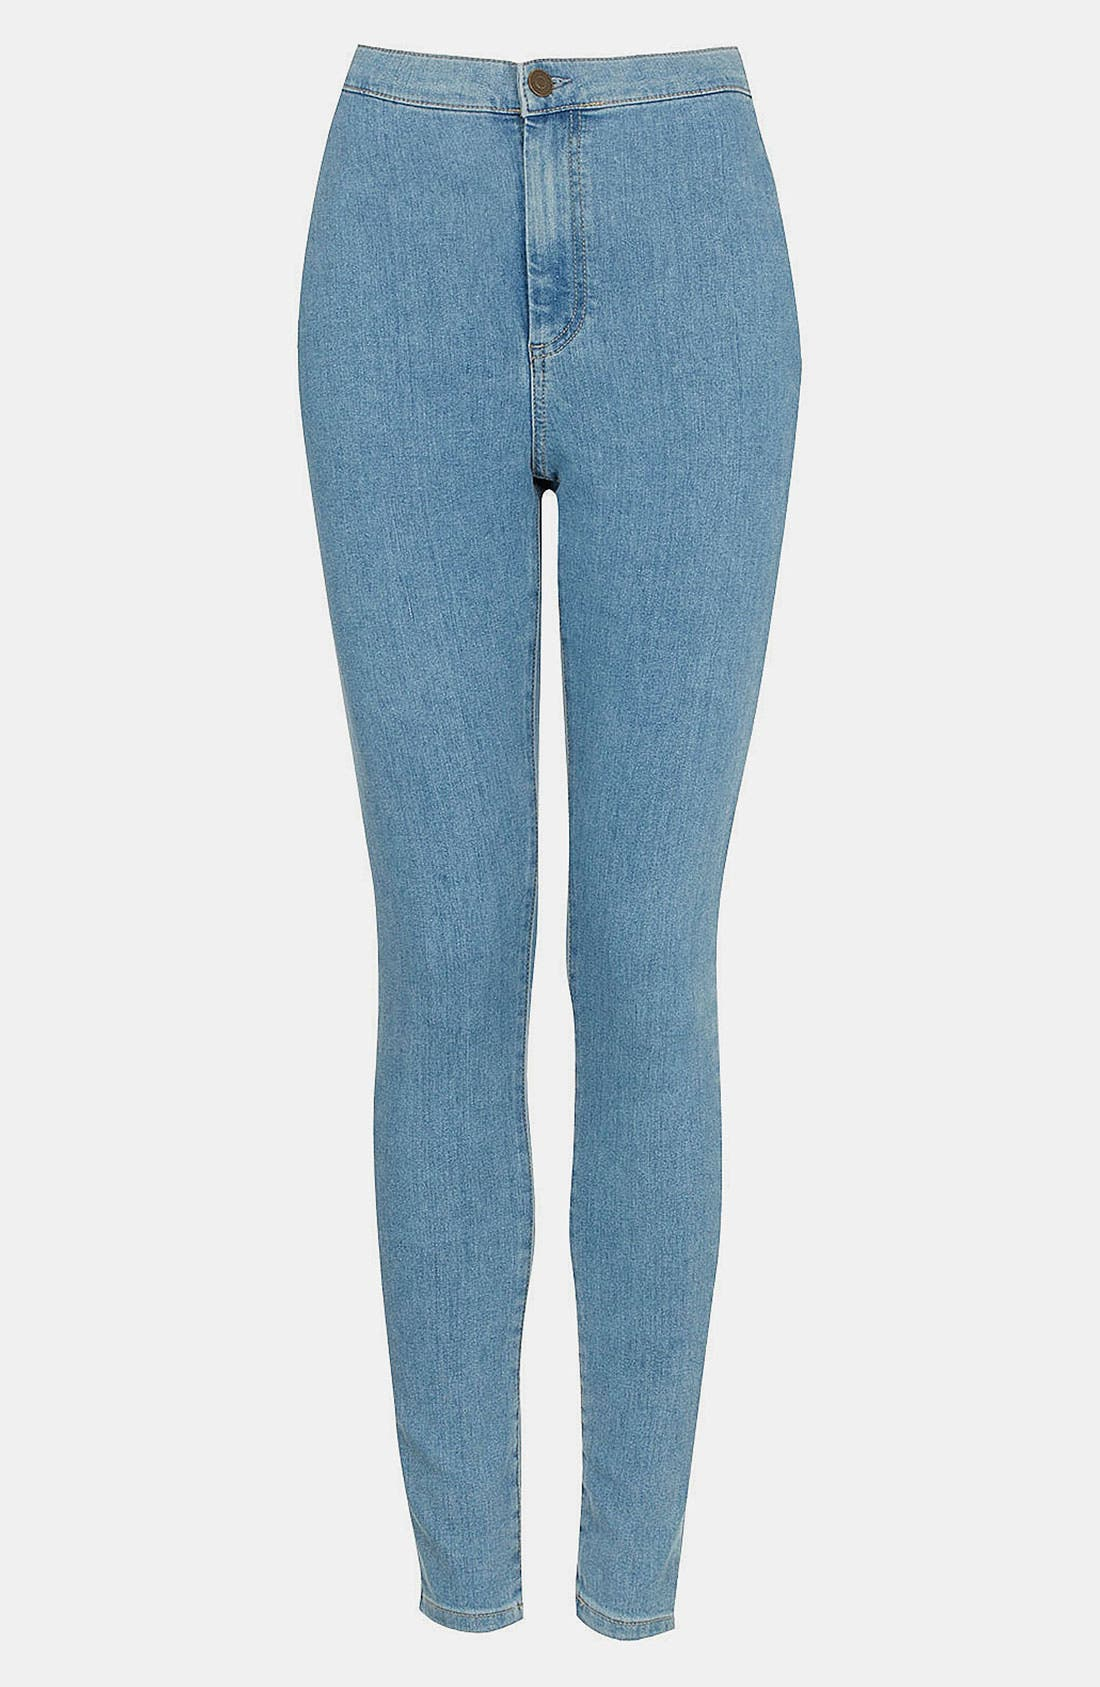 Main Image - Topshop Moto 'Joni' High Waist Skinny Jeans (Mid Stone) (Short)